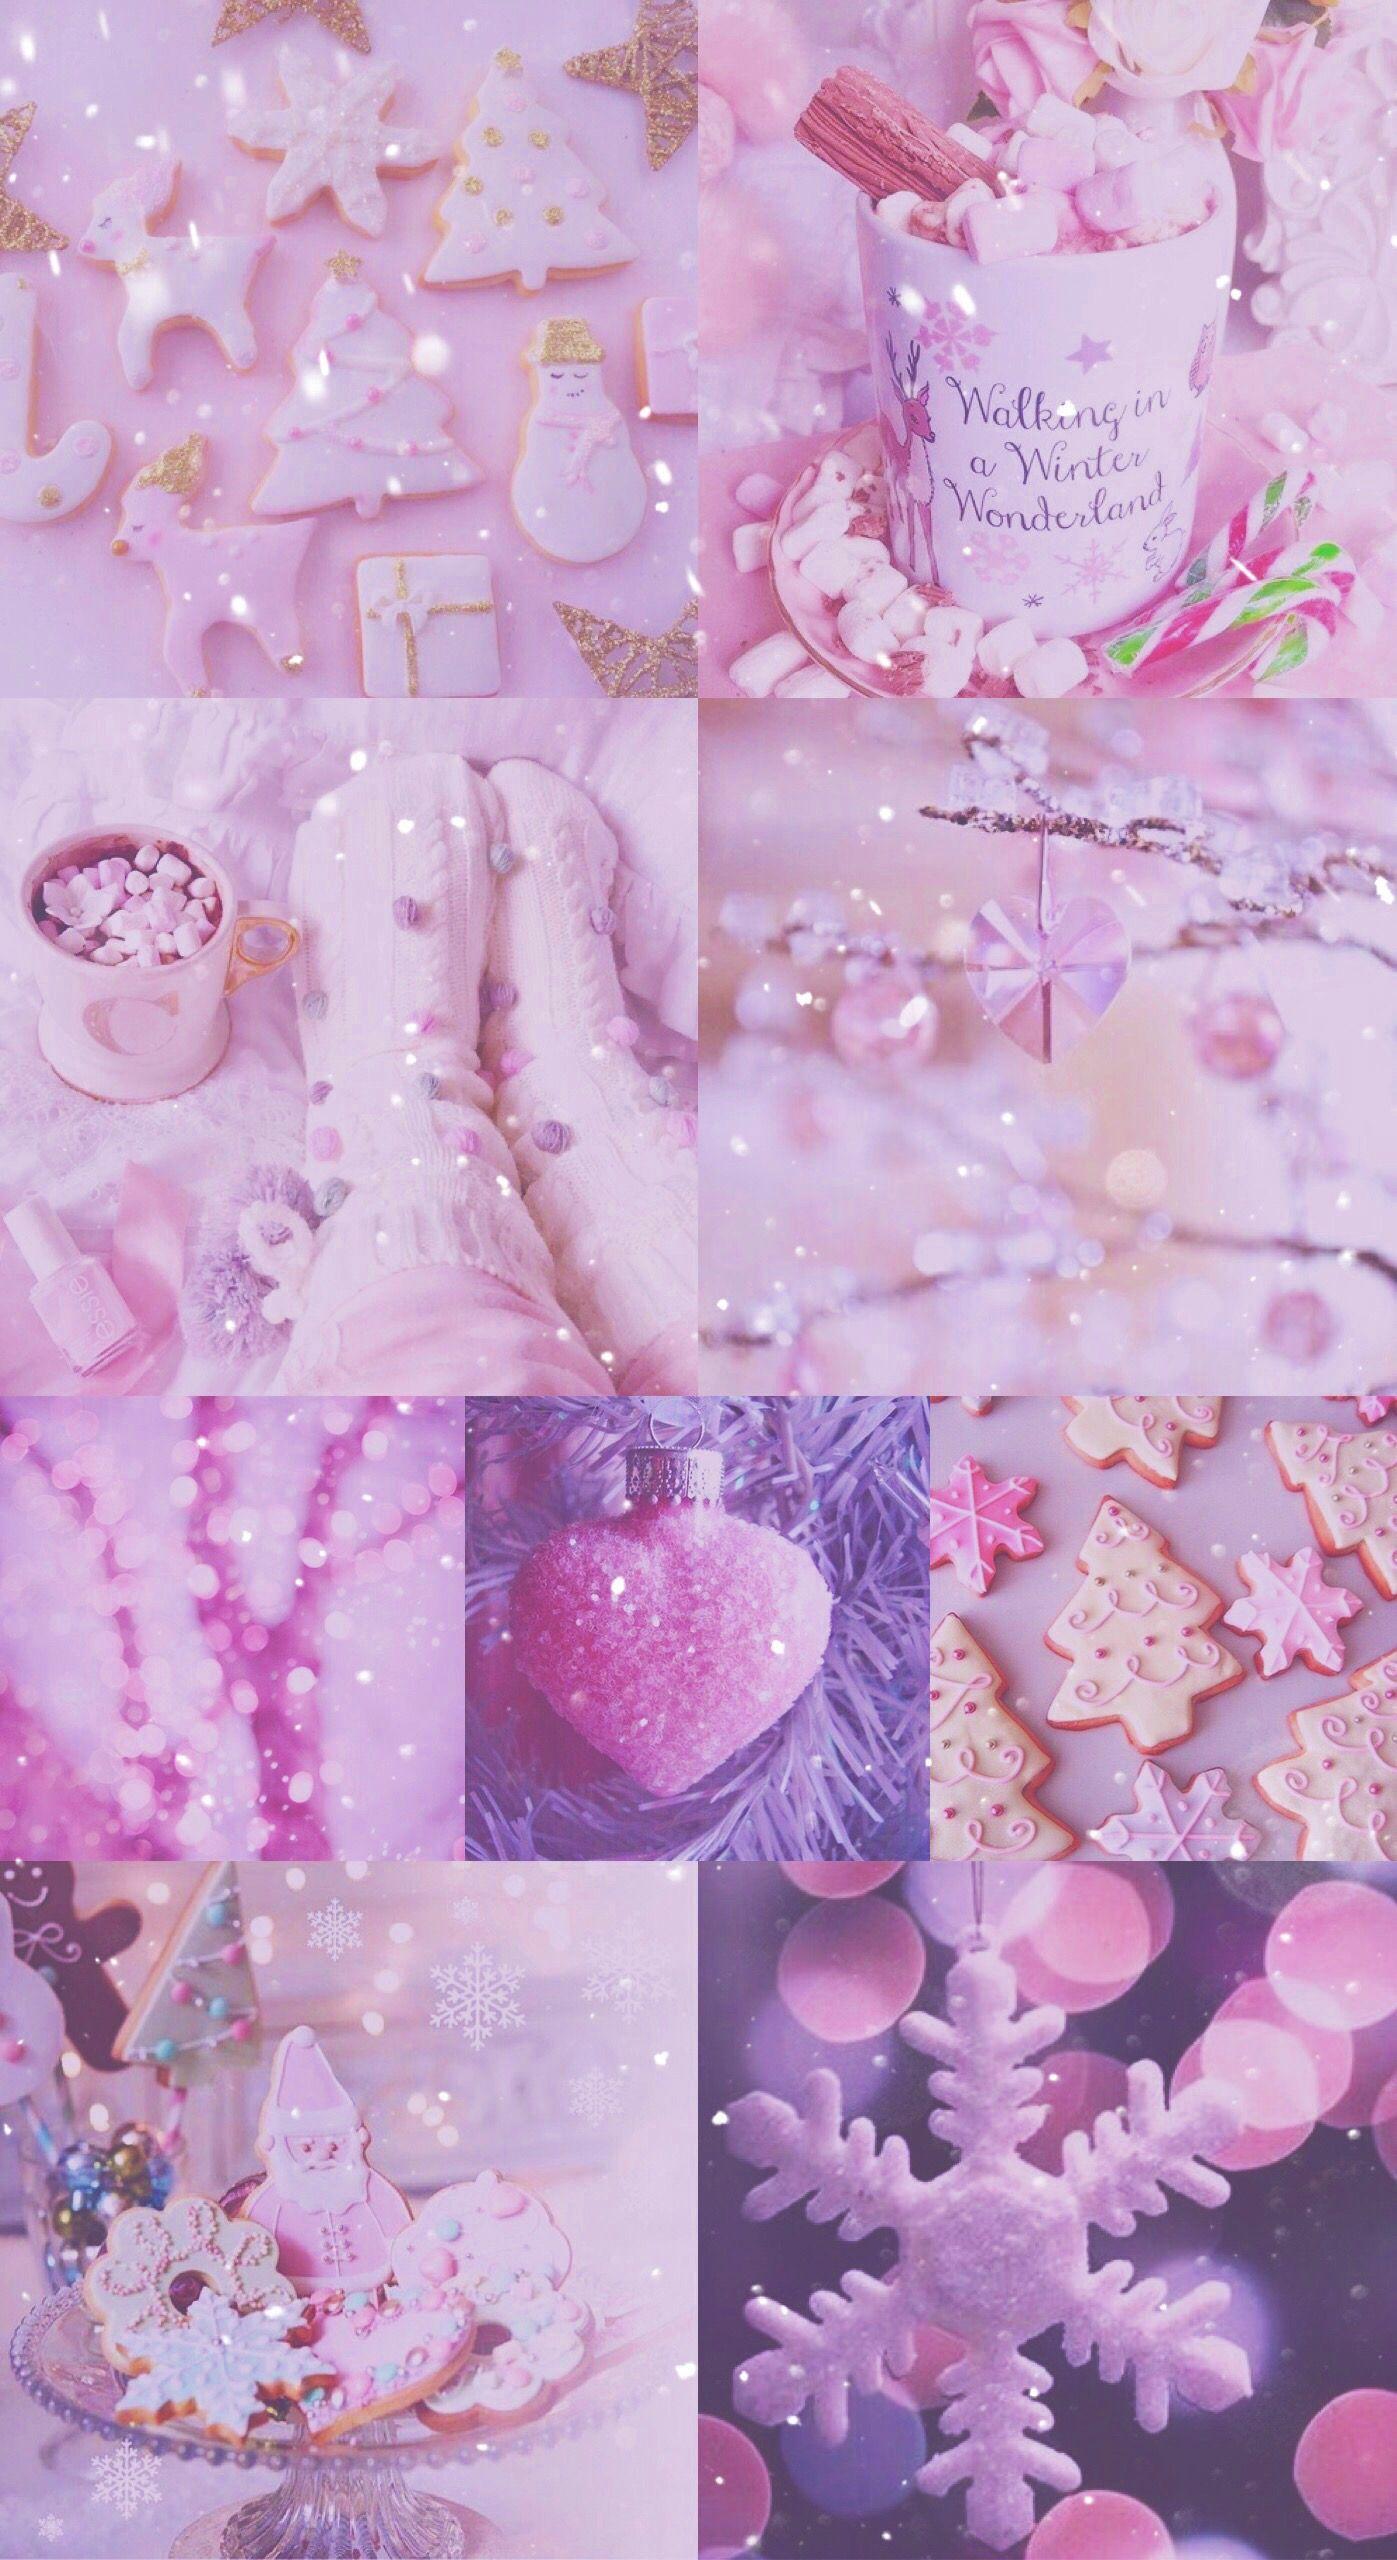 Xmas Christmas Pink Pretty Sparkly Glitter White IPhone Purple WallpaperWinter WallpaperMobile